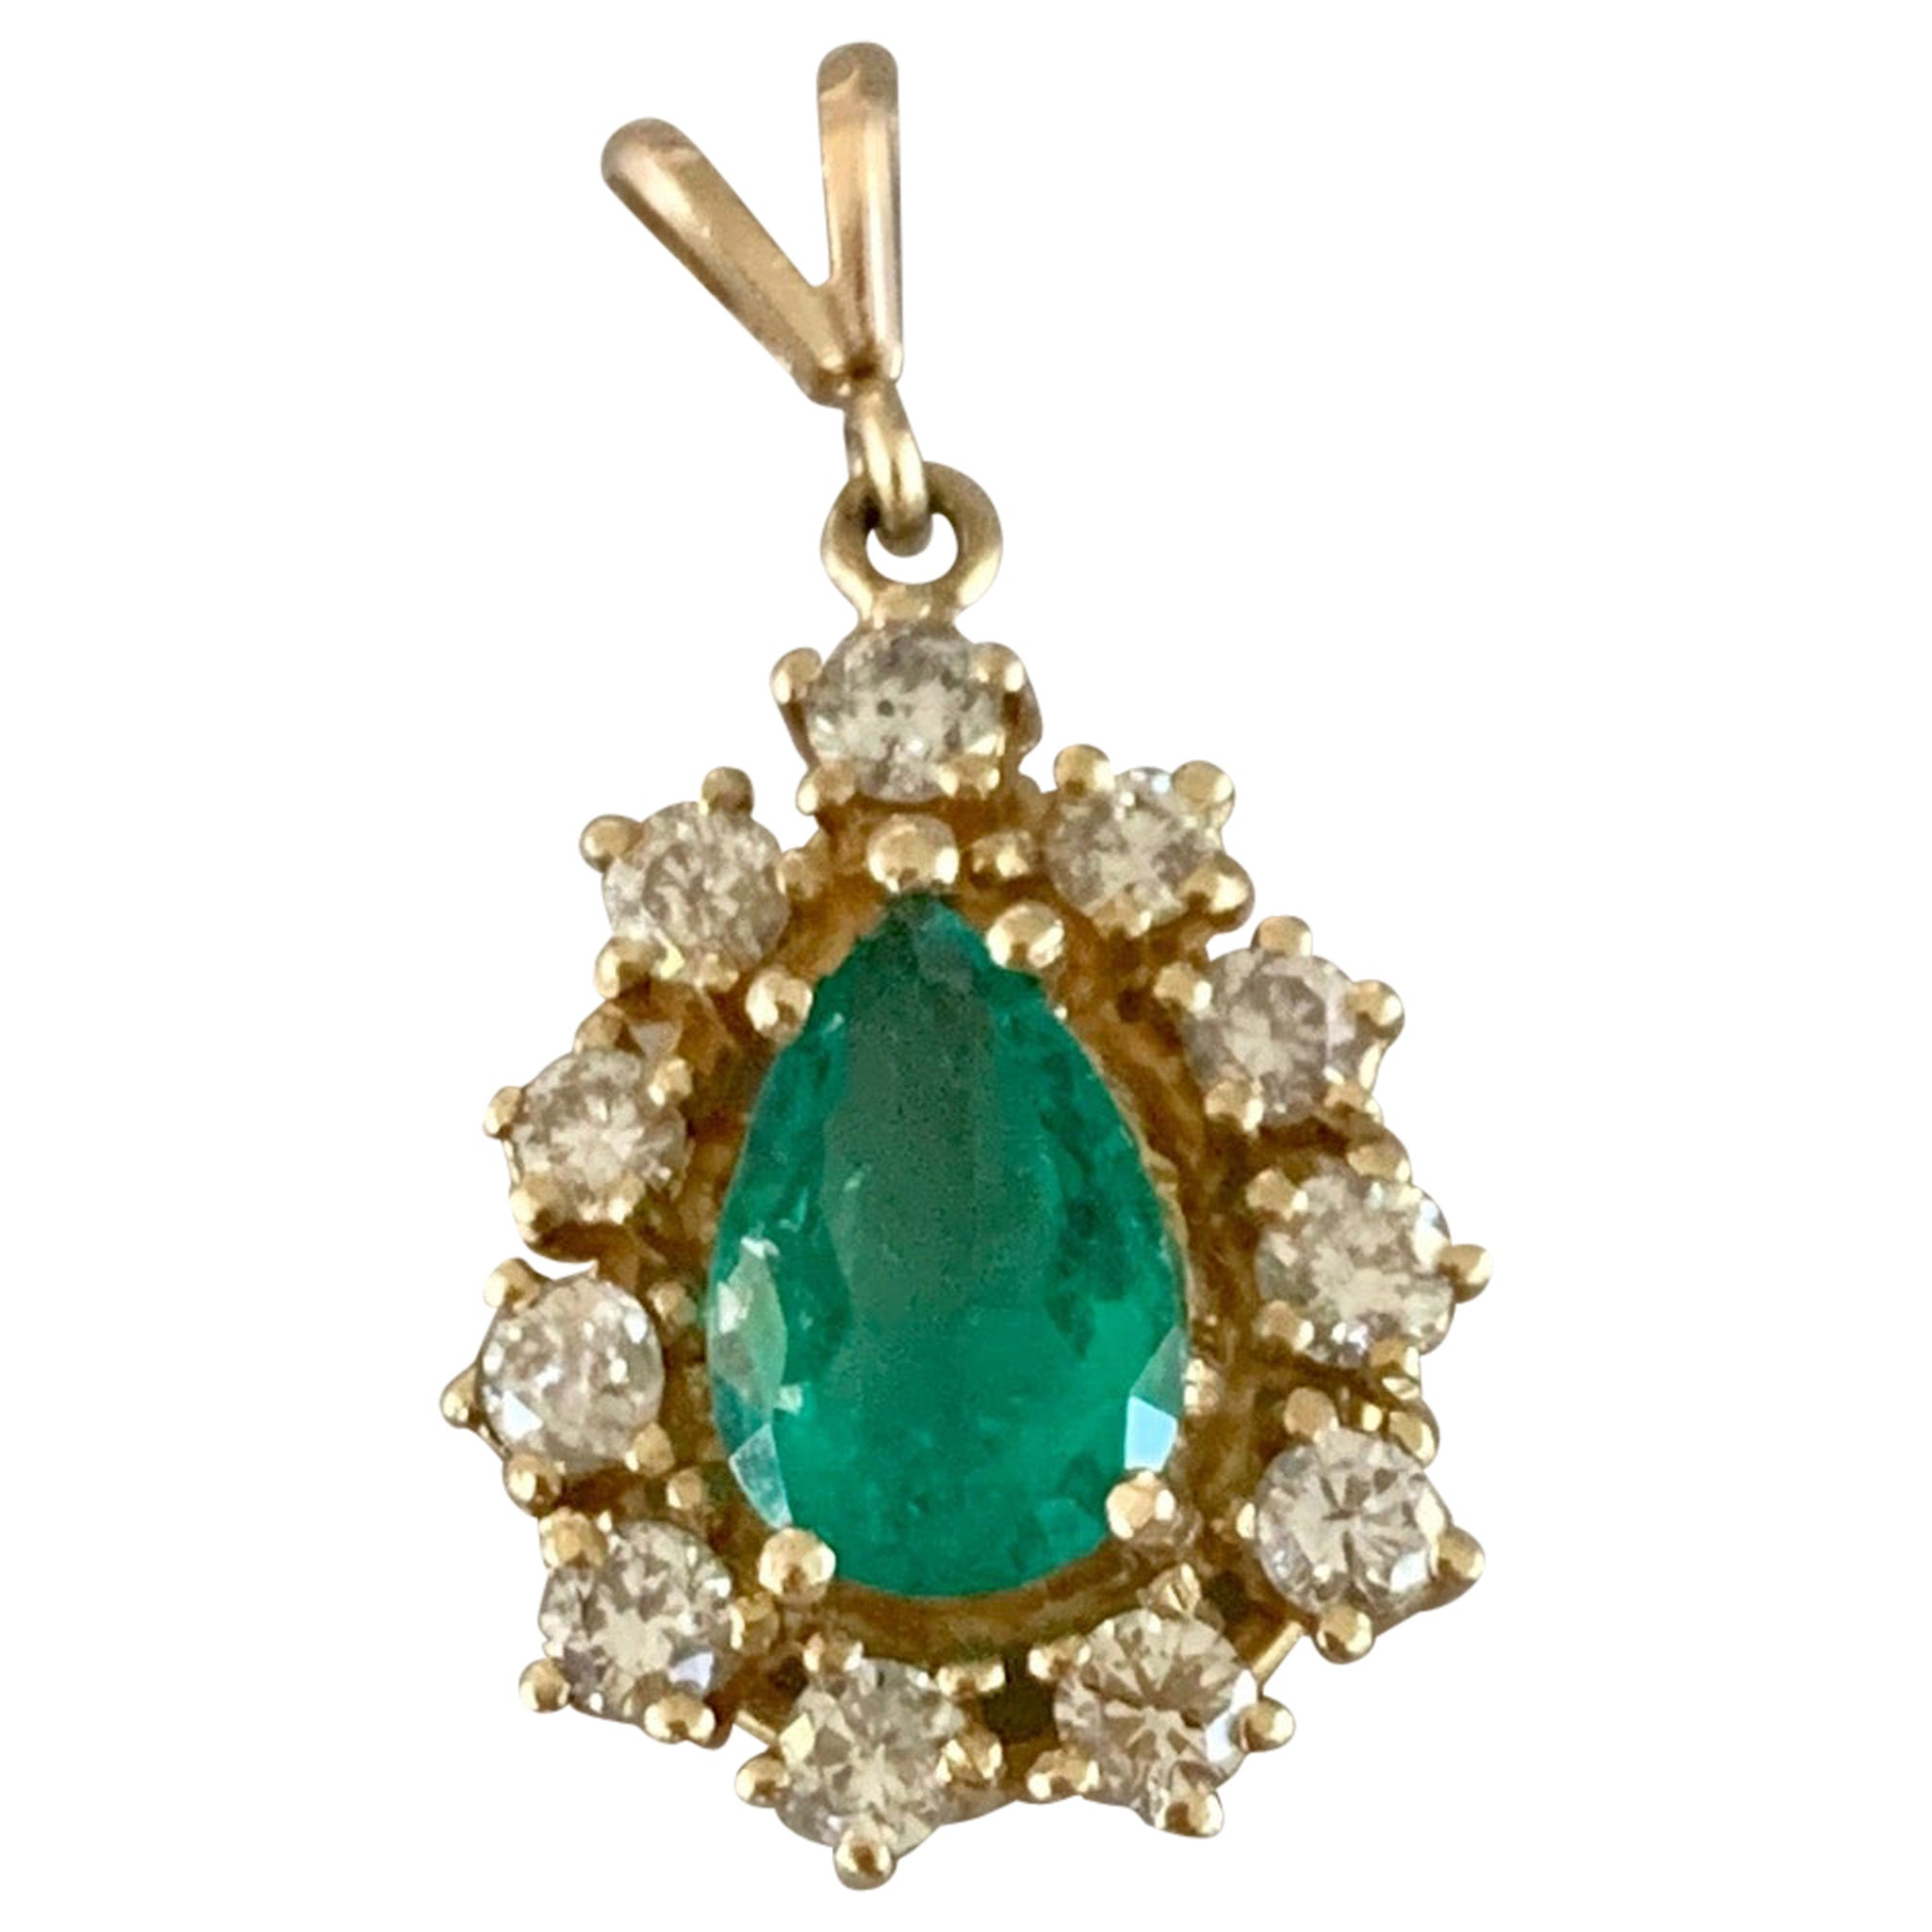 Vintage Pear Shaped Emerald and Diamond Halo 14 Karat Yellow Gold Pendant